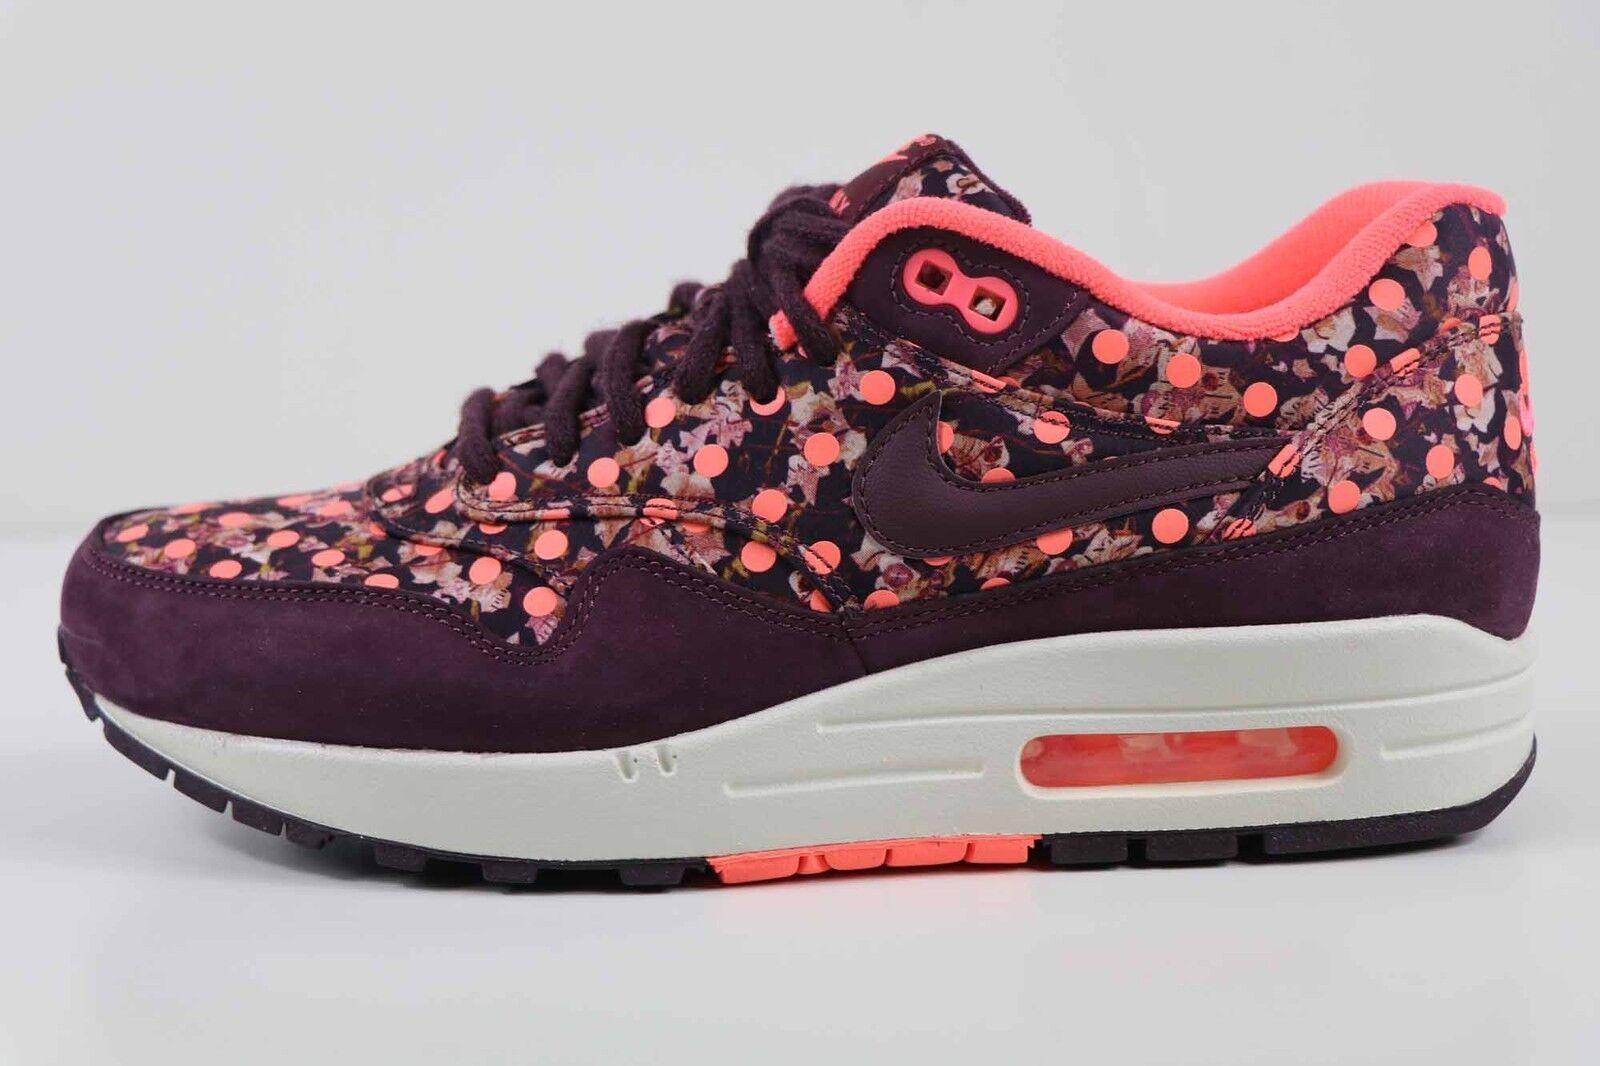 Nike Nike Nike Air Max Donne 1 Lib Qs Liberty Borgogna Mango 540855 600 Nuove Dimensioni 7,5 c9a3c4